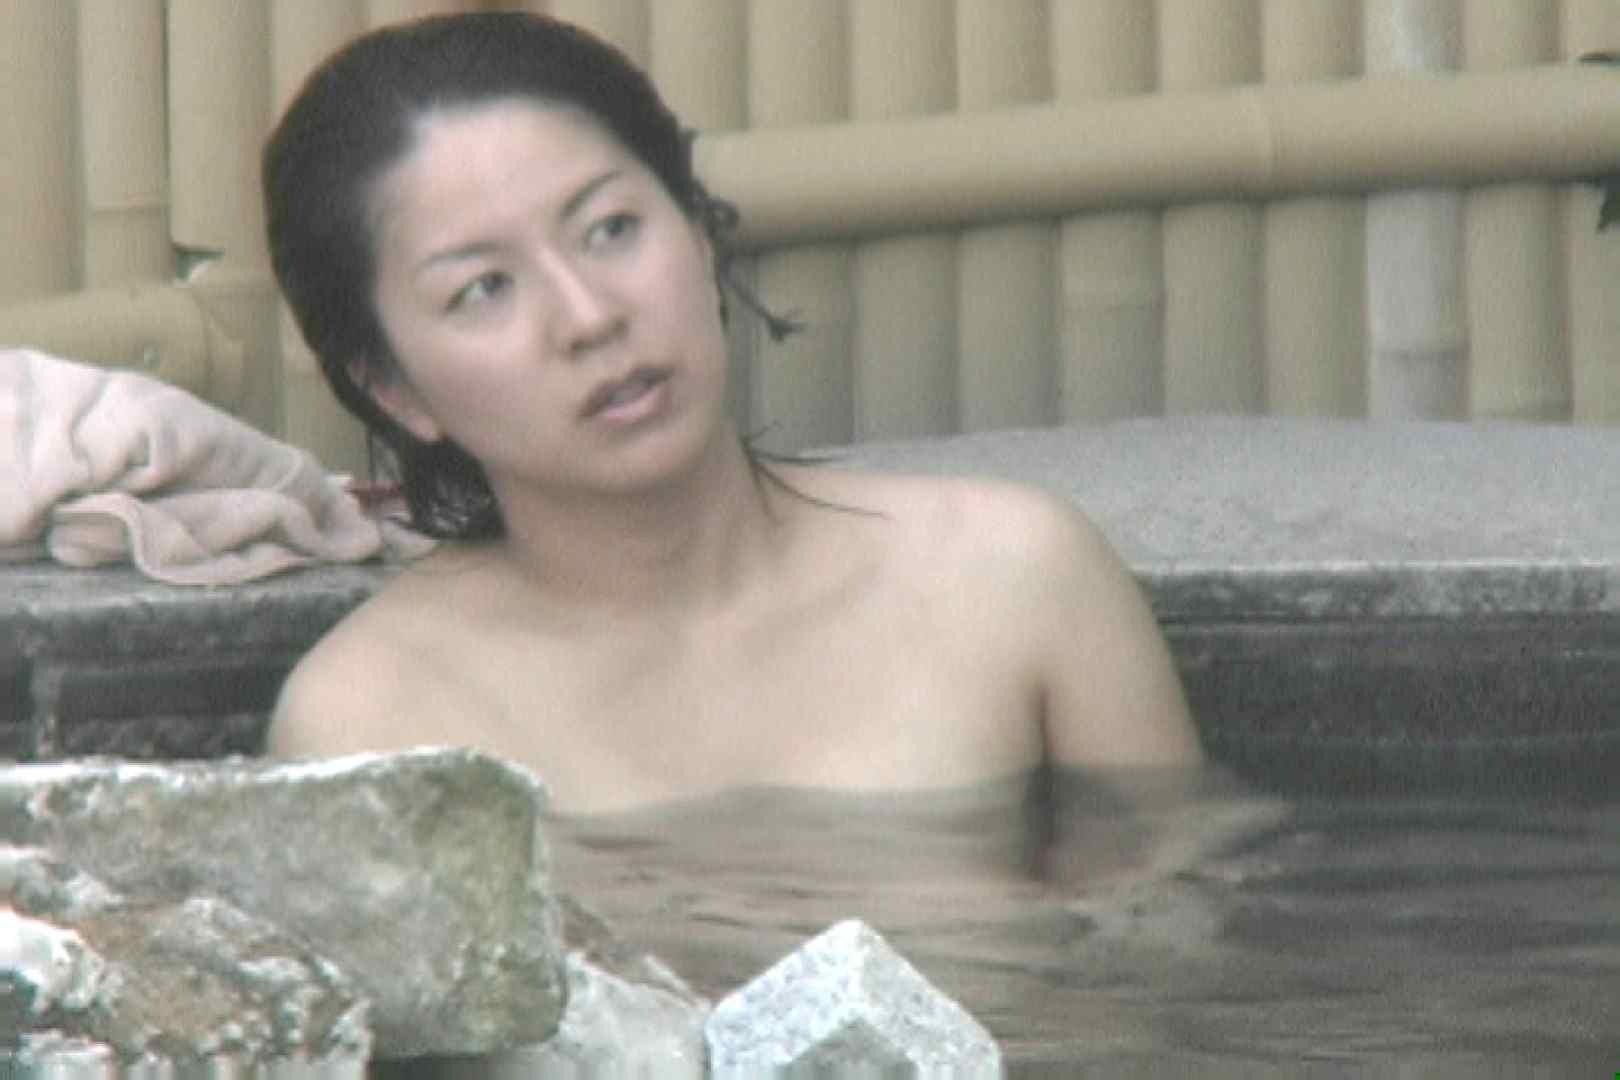 Aquaな露天風呂Vol.694 露天 | OLセックス  67画像 58